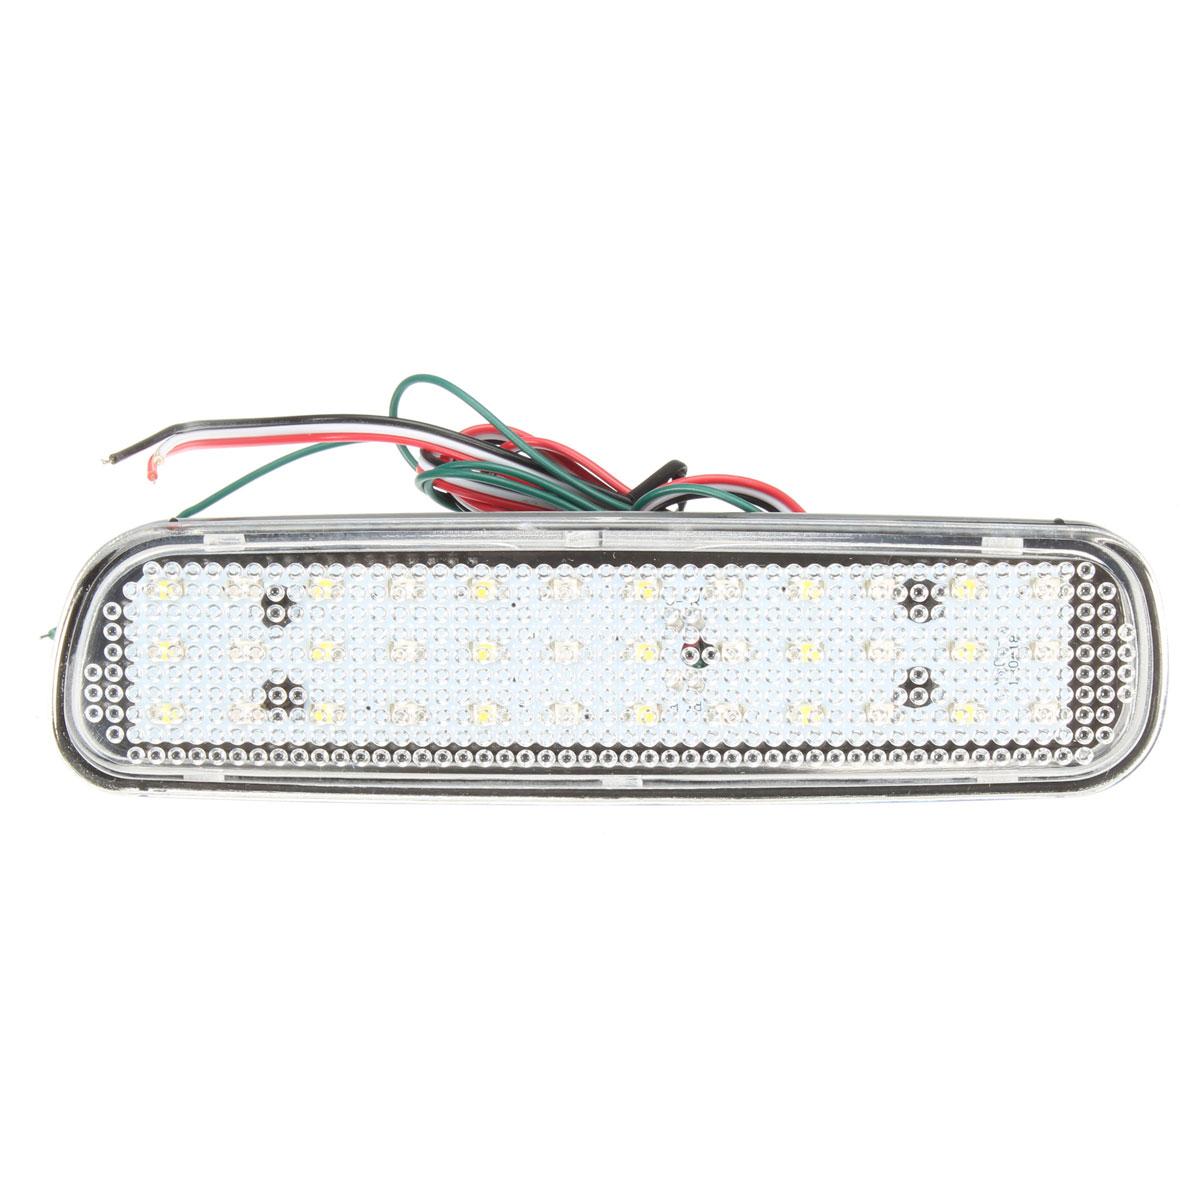 Пара задний бампер отражатель LED тормоз хвост свет сигнала поворота противотуманная фара для LEXUS LX470 - фото 4